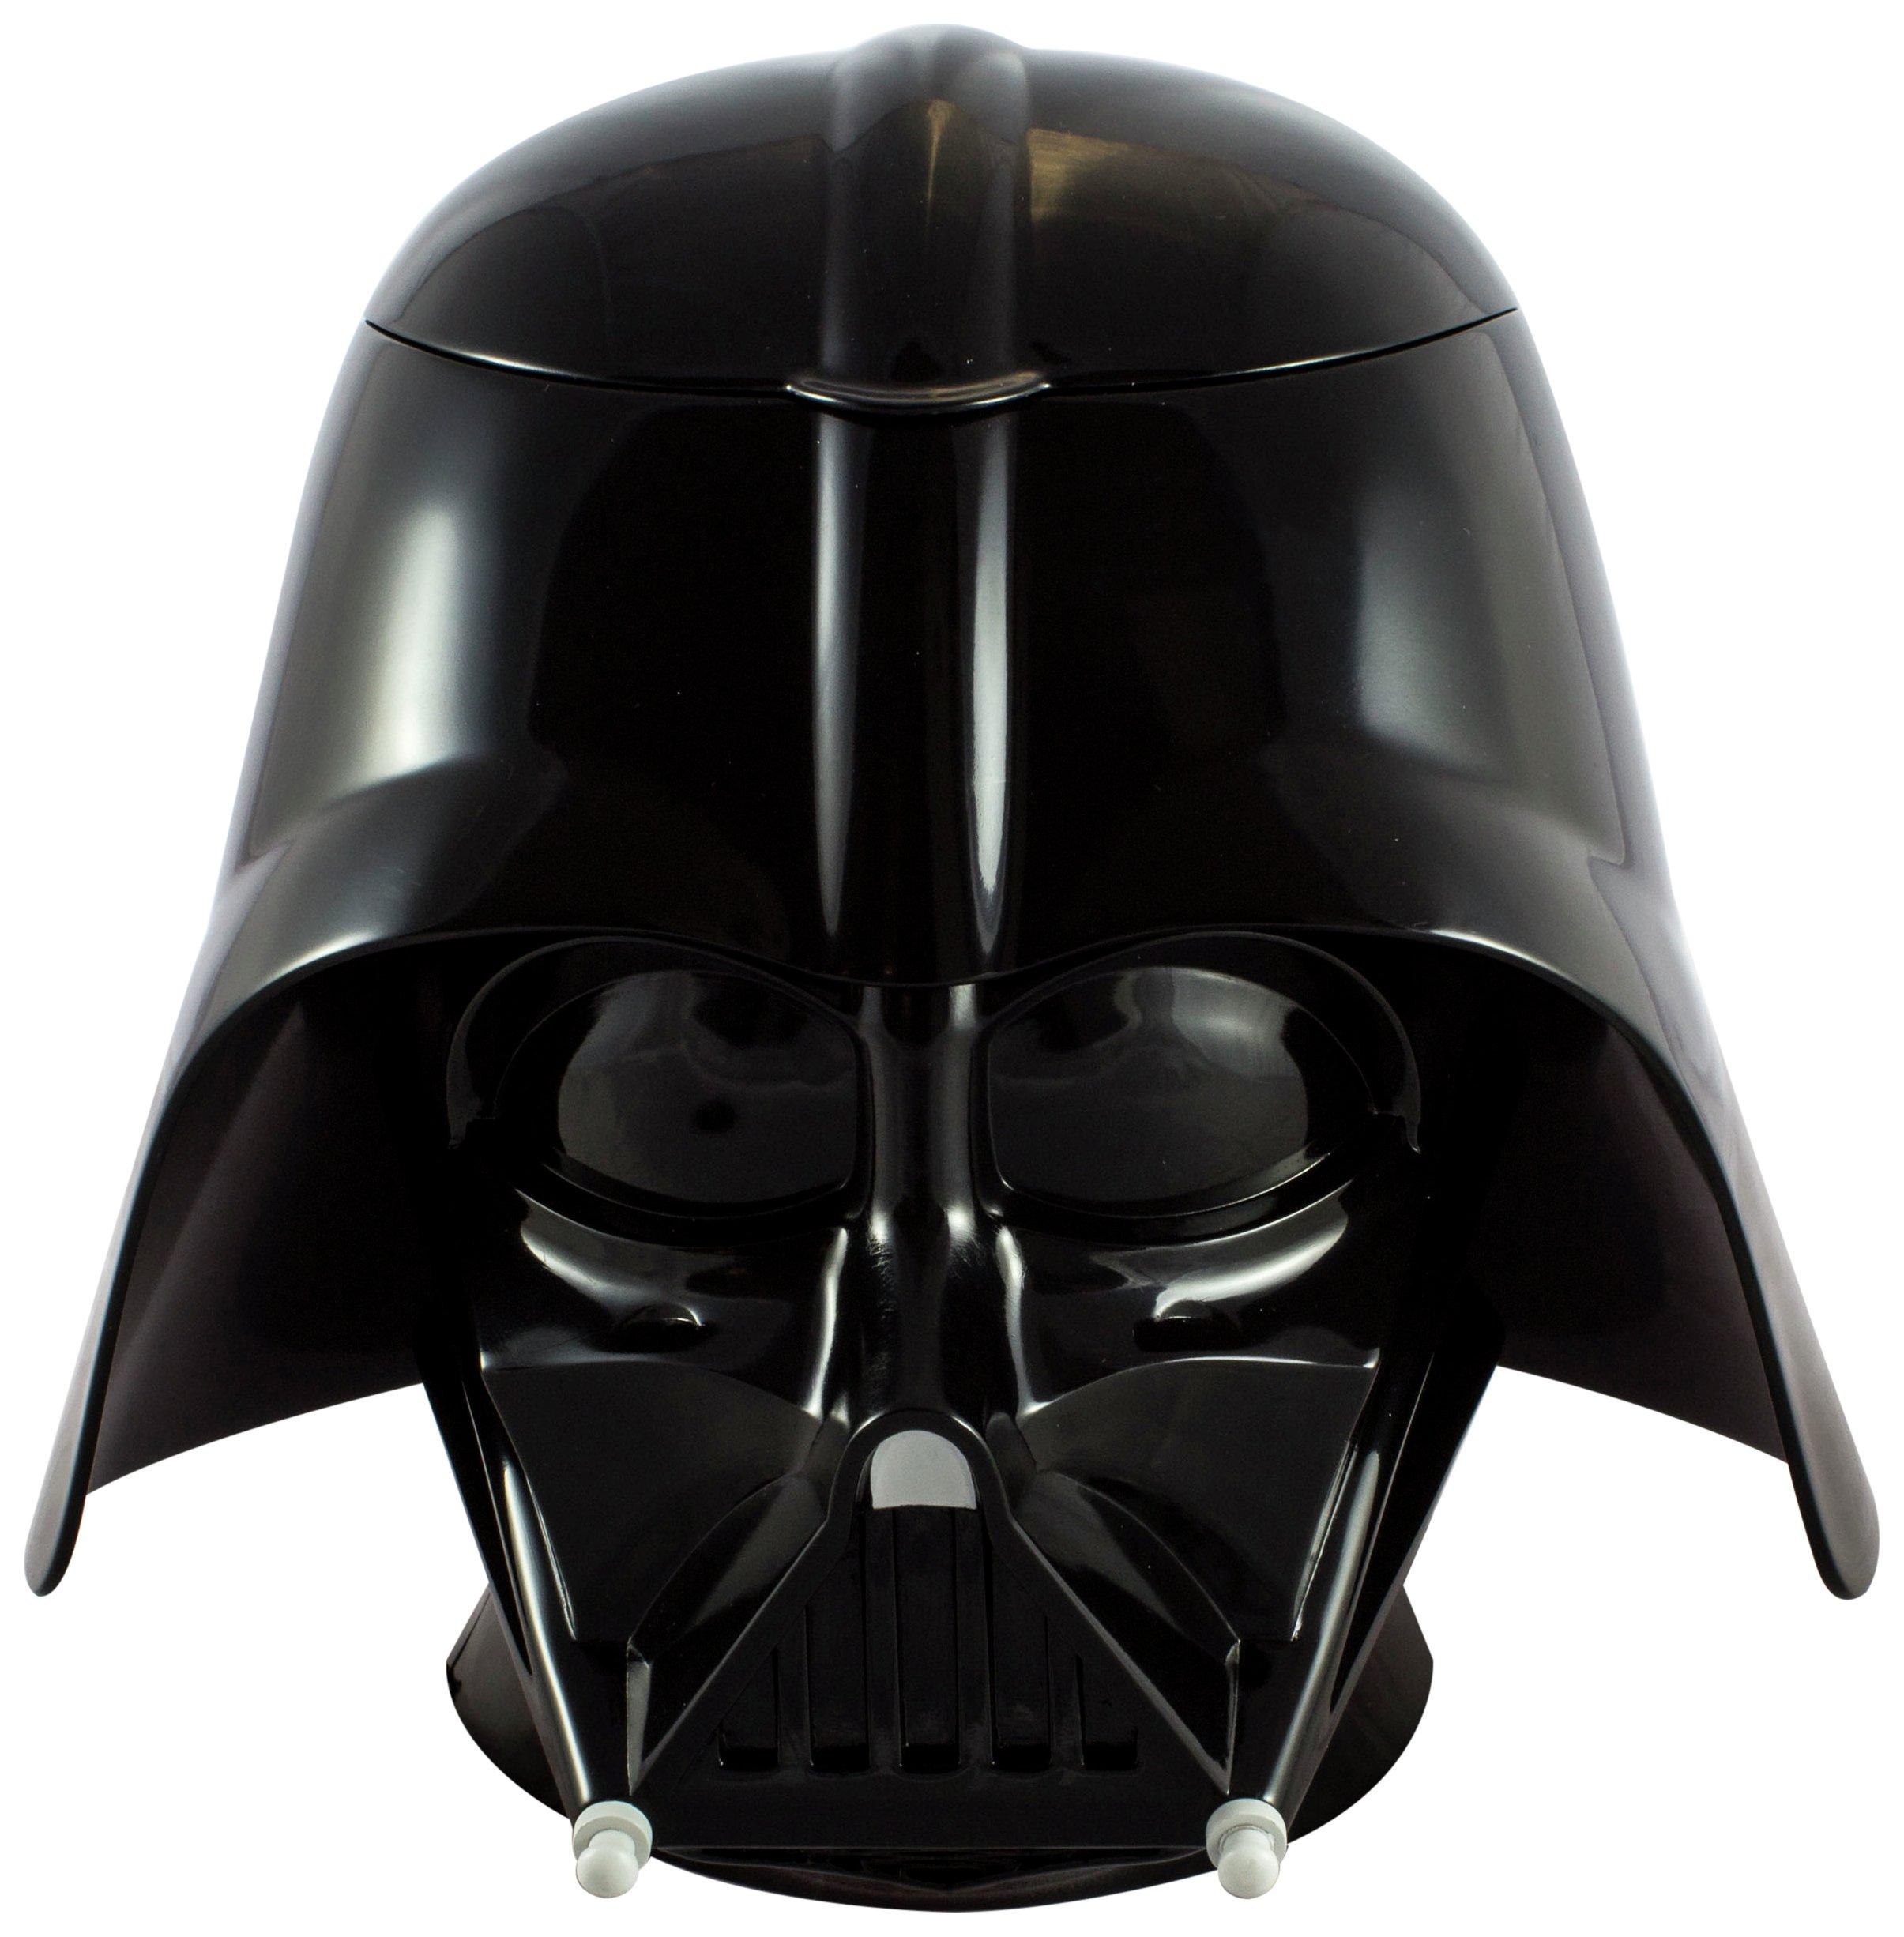 Star Wars Darth Vadar Cookie Jar with Sounds